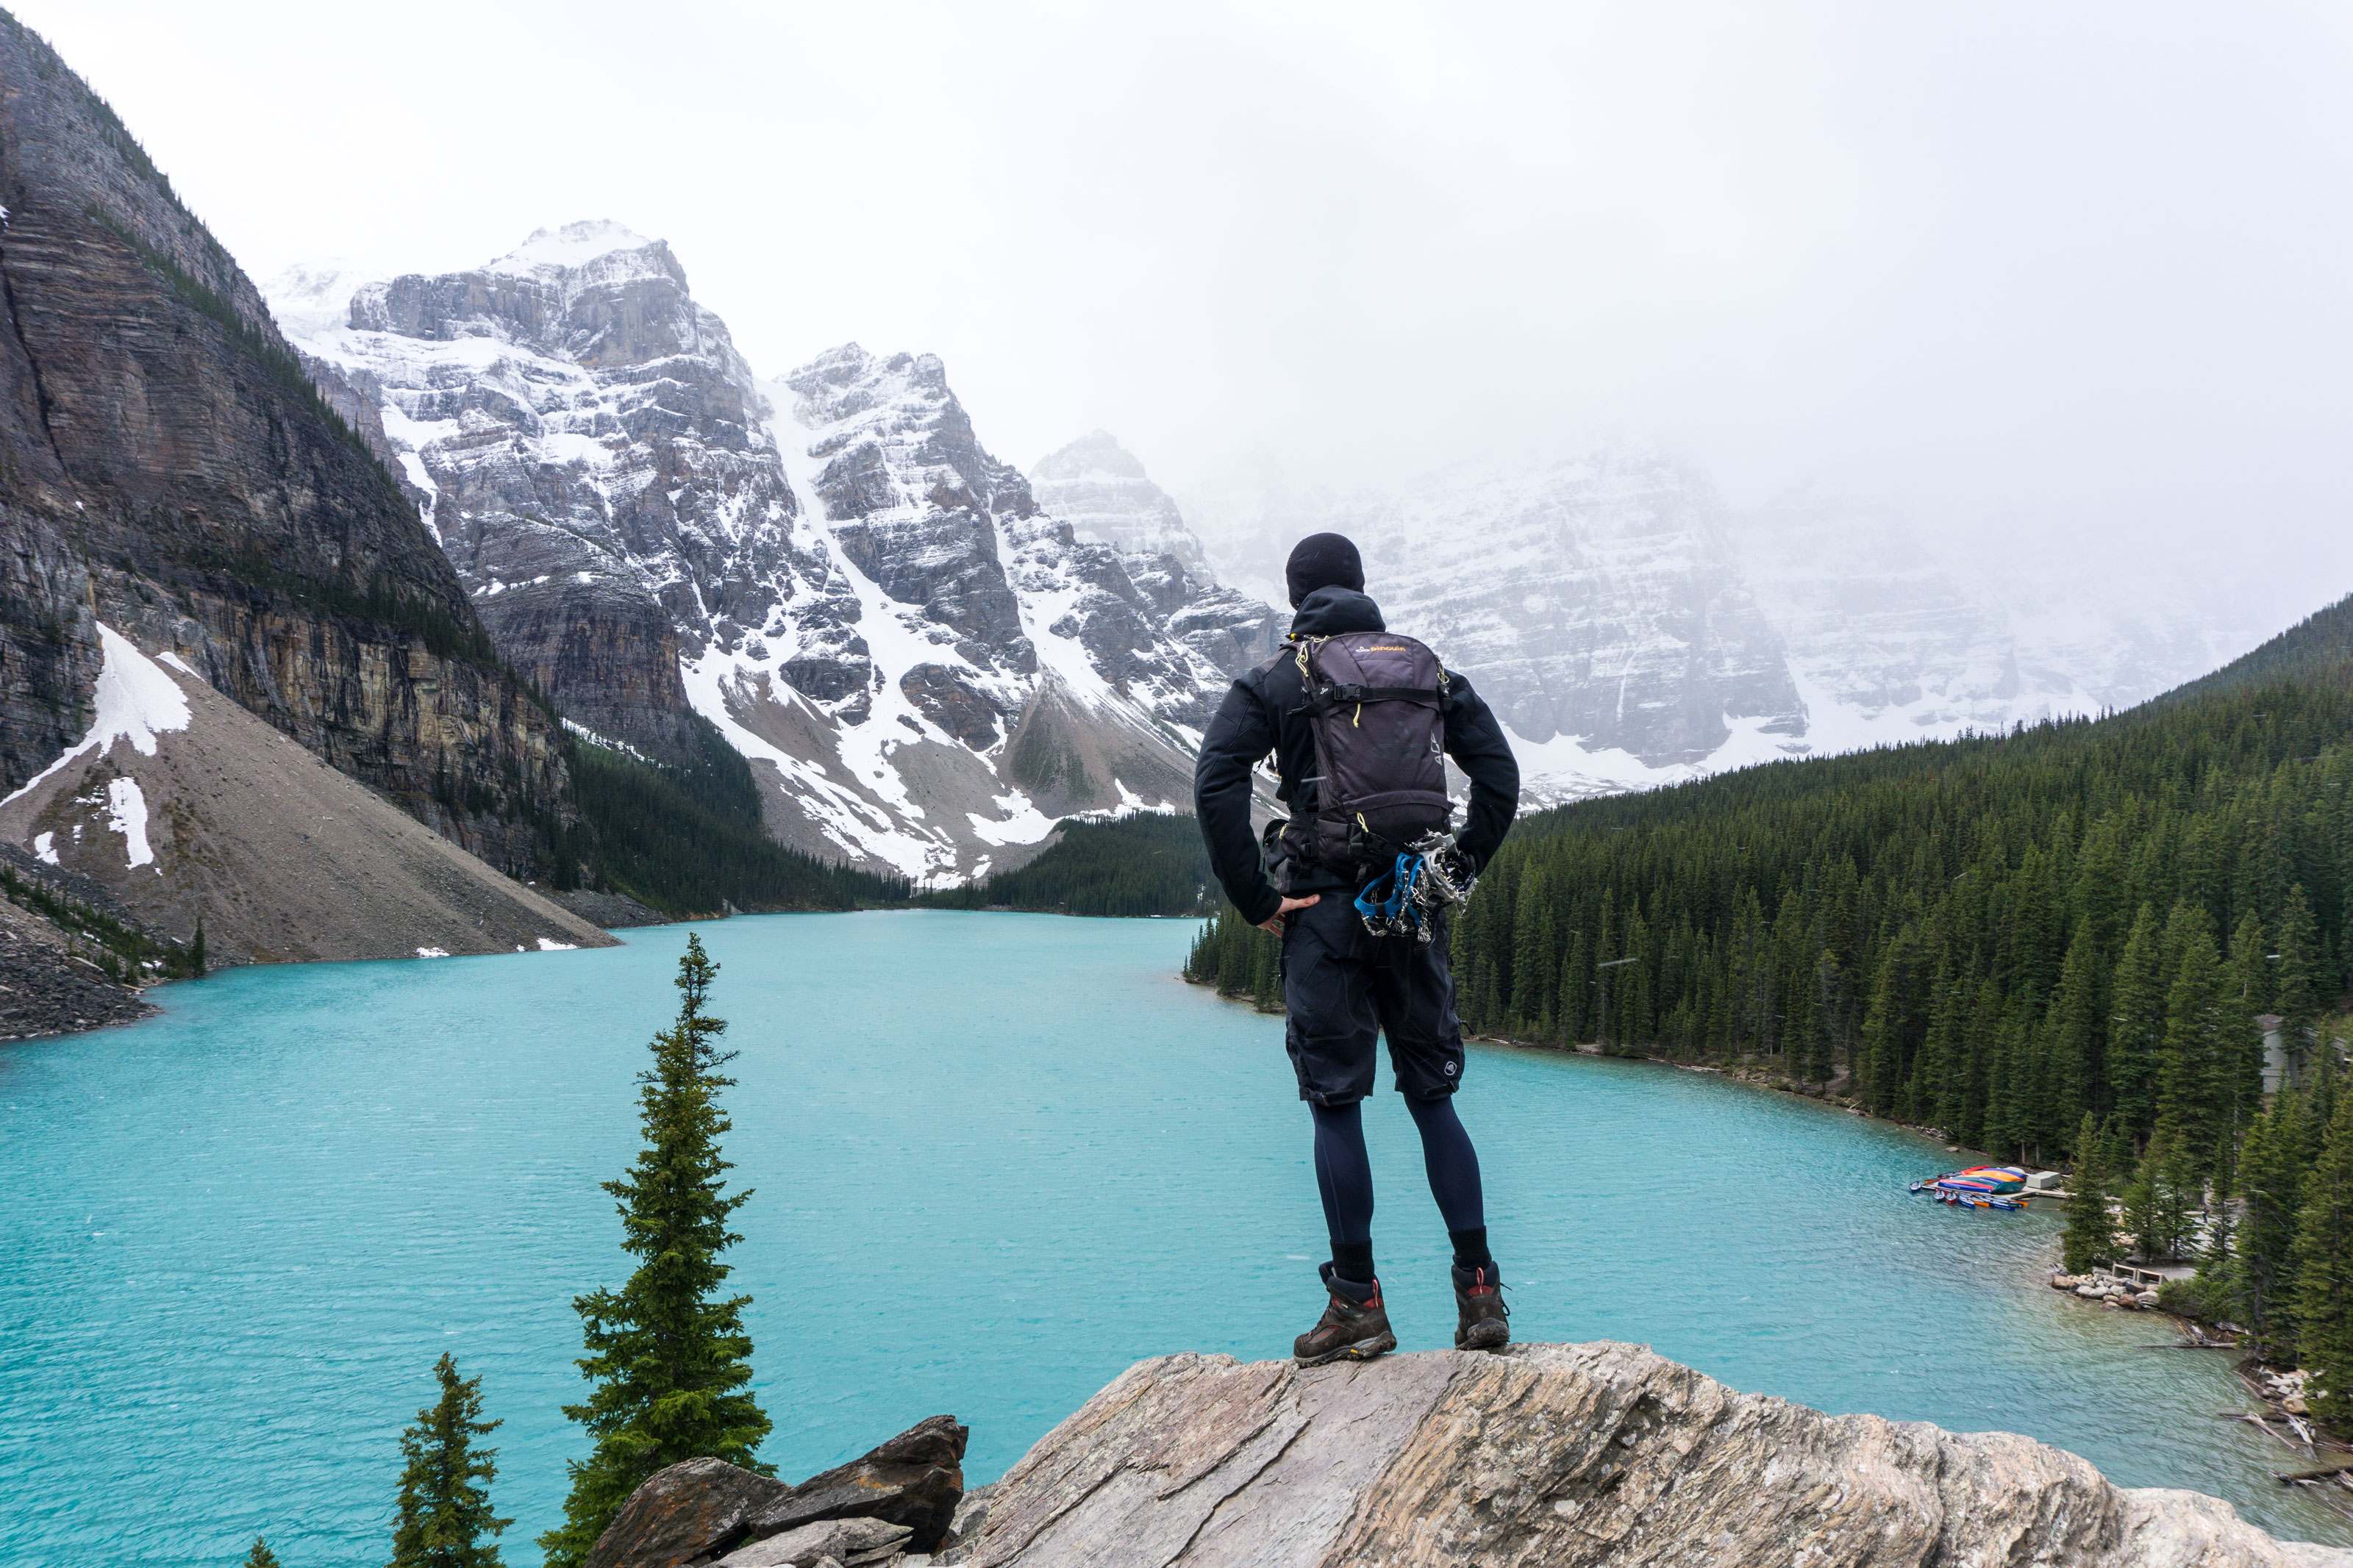 Kolem Moraine Lake v Údolí deseti vrcholů na Sentinel Pass a Eiffel Lake